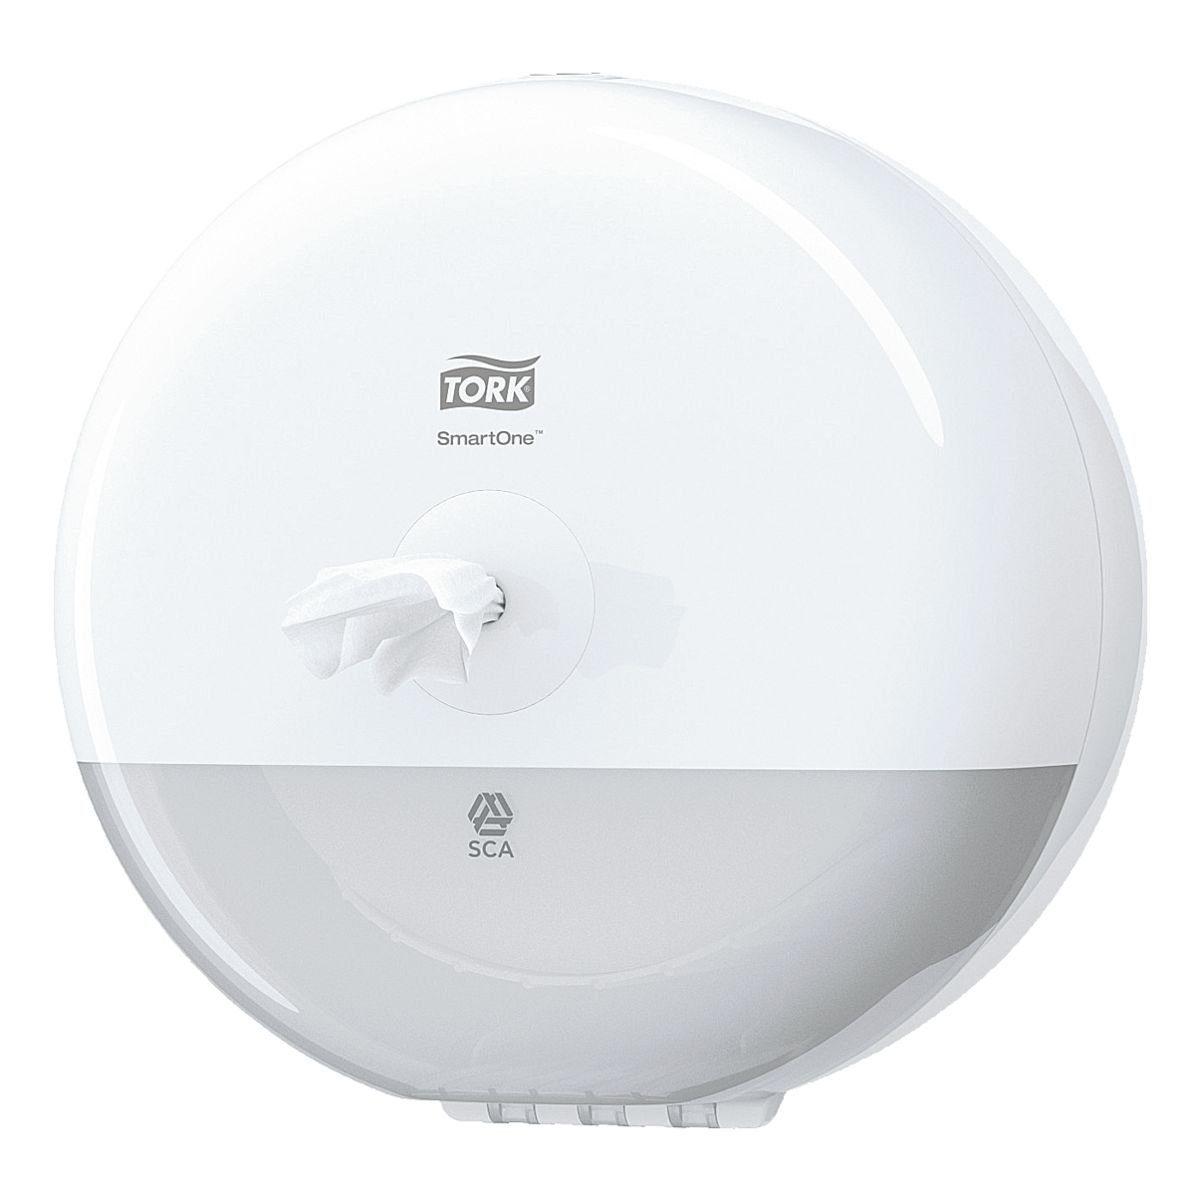 TORK Toilettenpapier-Einzelrollenspender »SmartOne® mini«